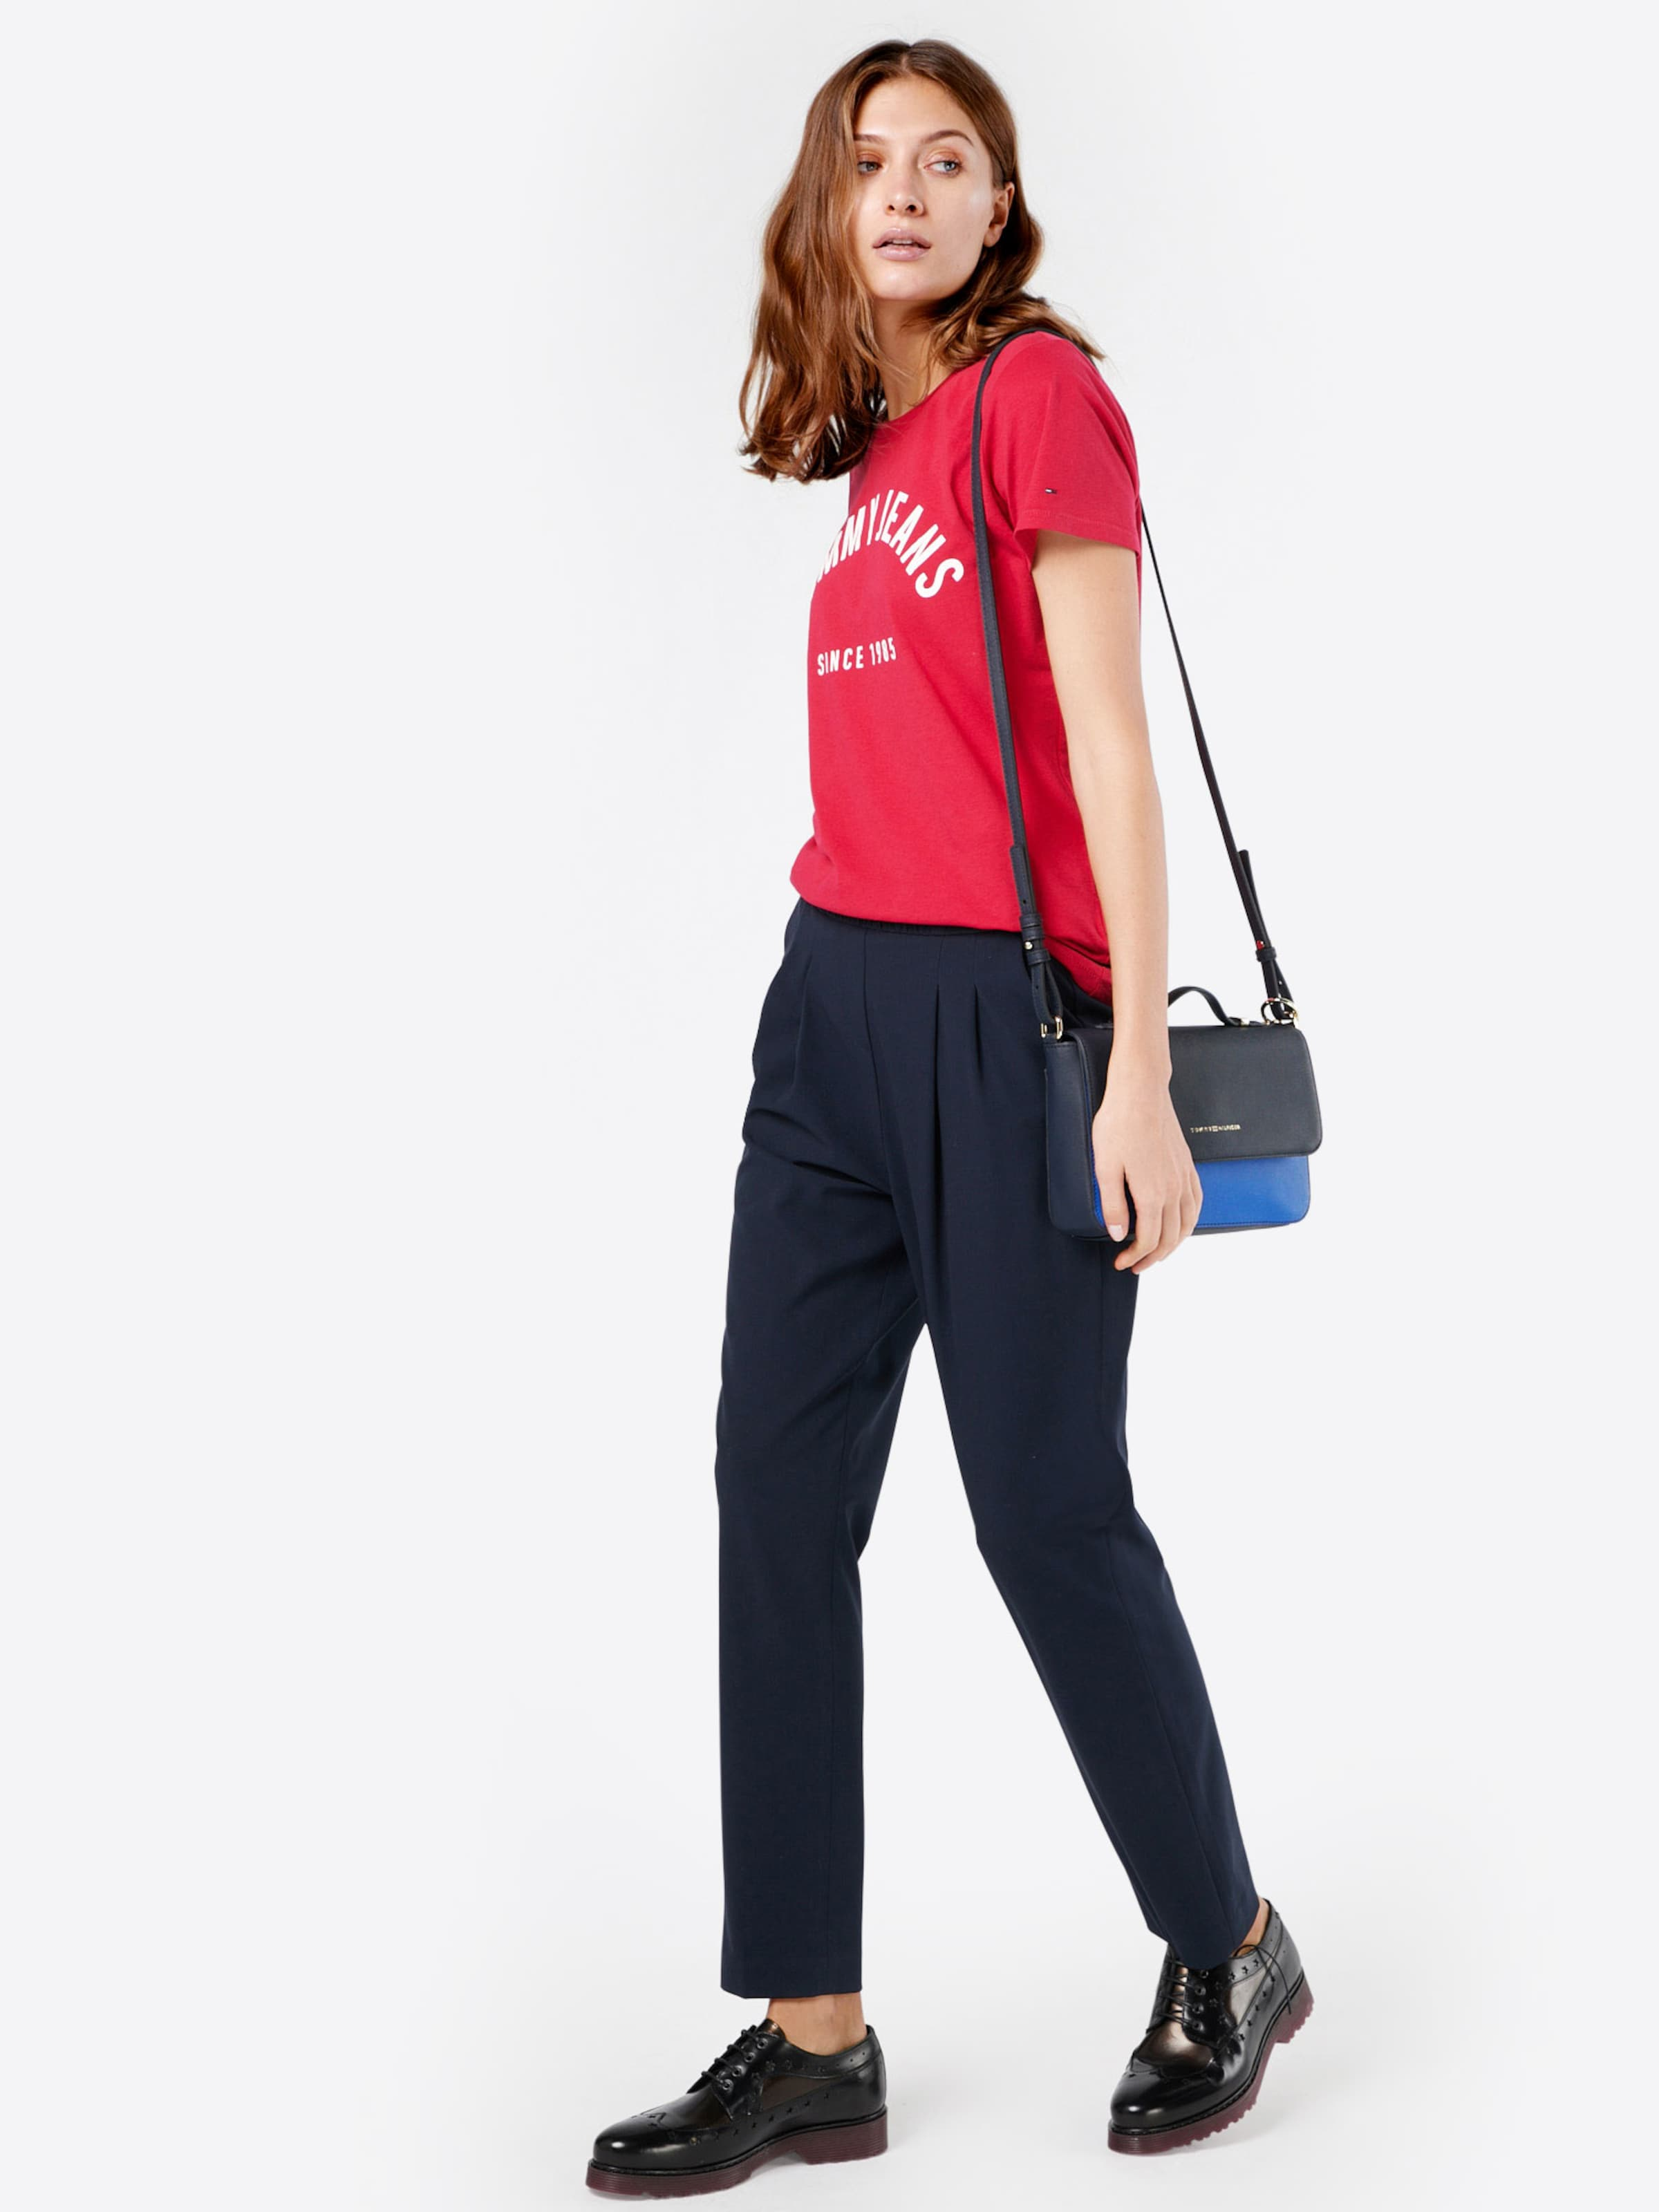 Spielraum Online-Shop Nicekicks Tommy Jeans T-Shirt mit Logo-Print Billig Perfekt w4ElkS